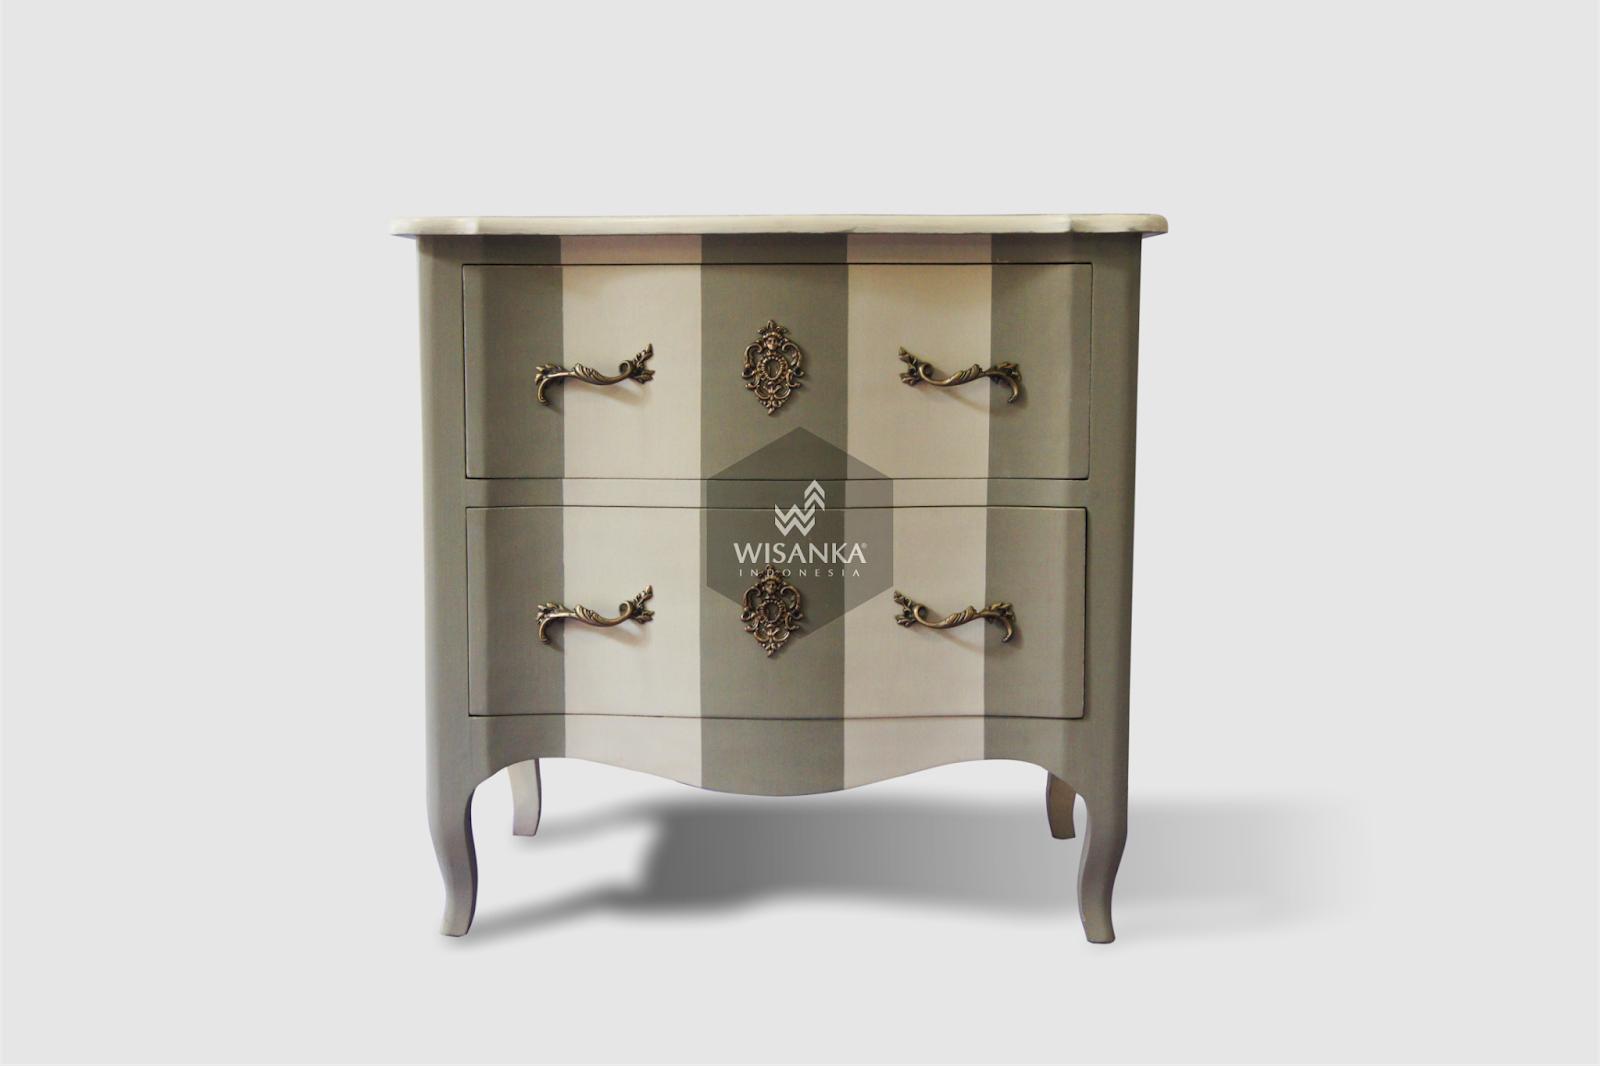 Teak Wood Lounge Furniture